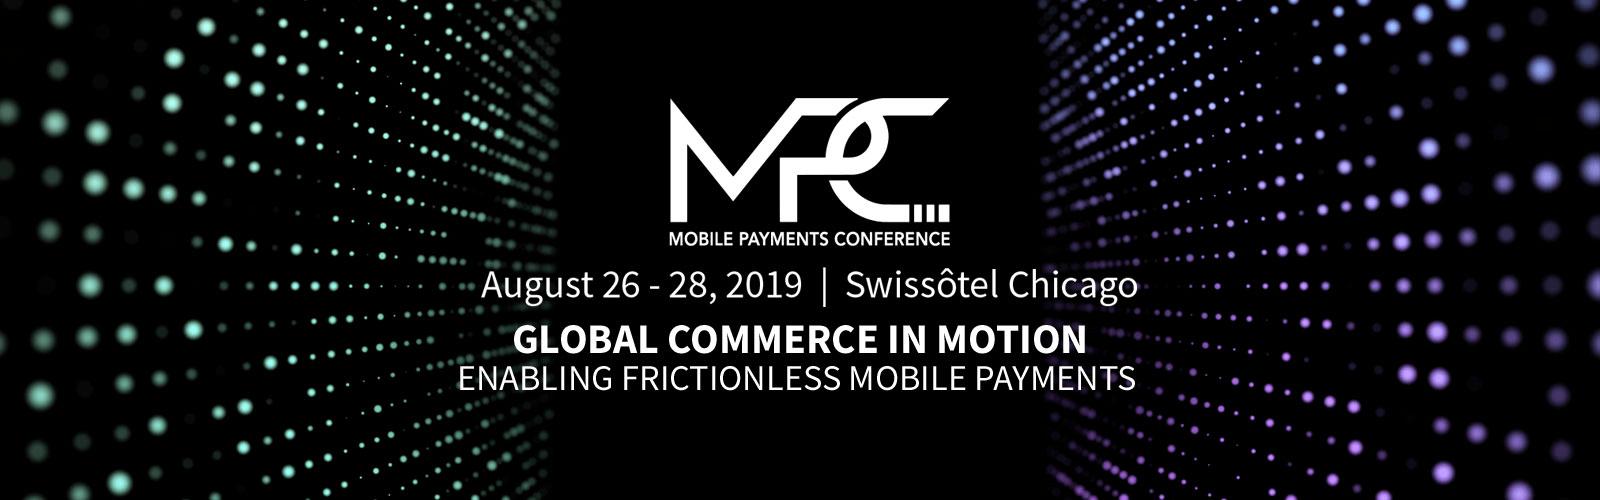 Mobile Payments Conference - Fintech Conferences